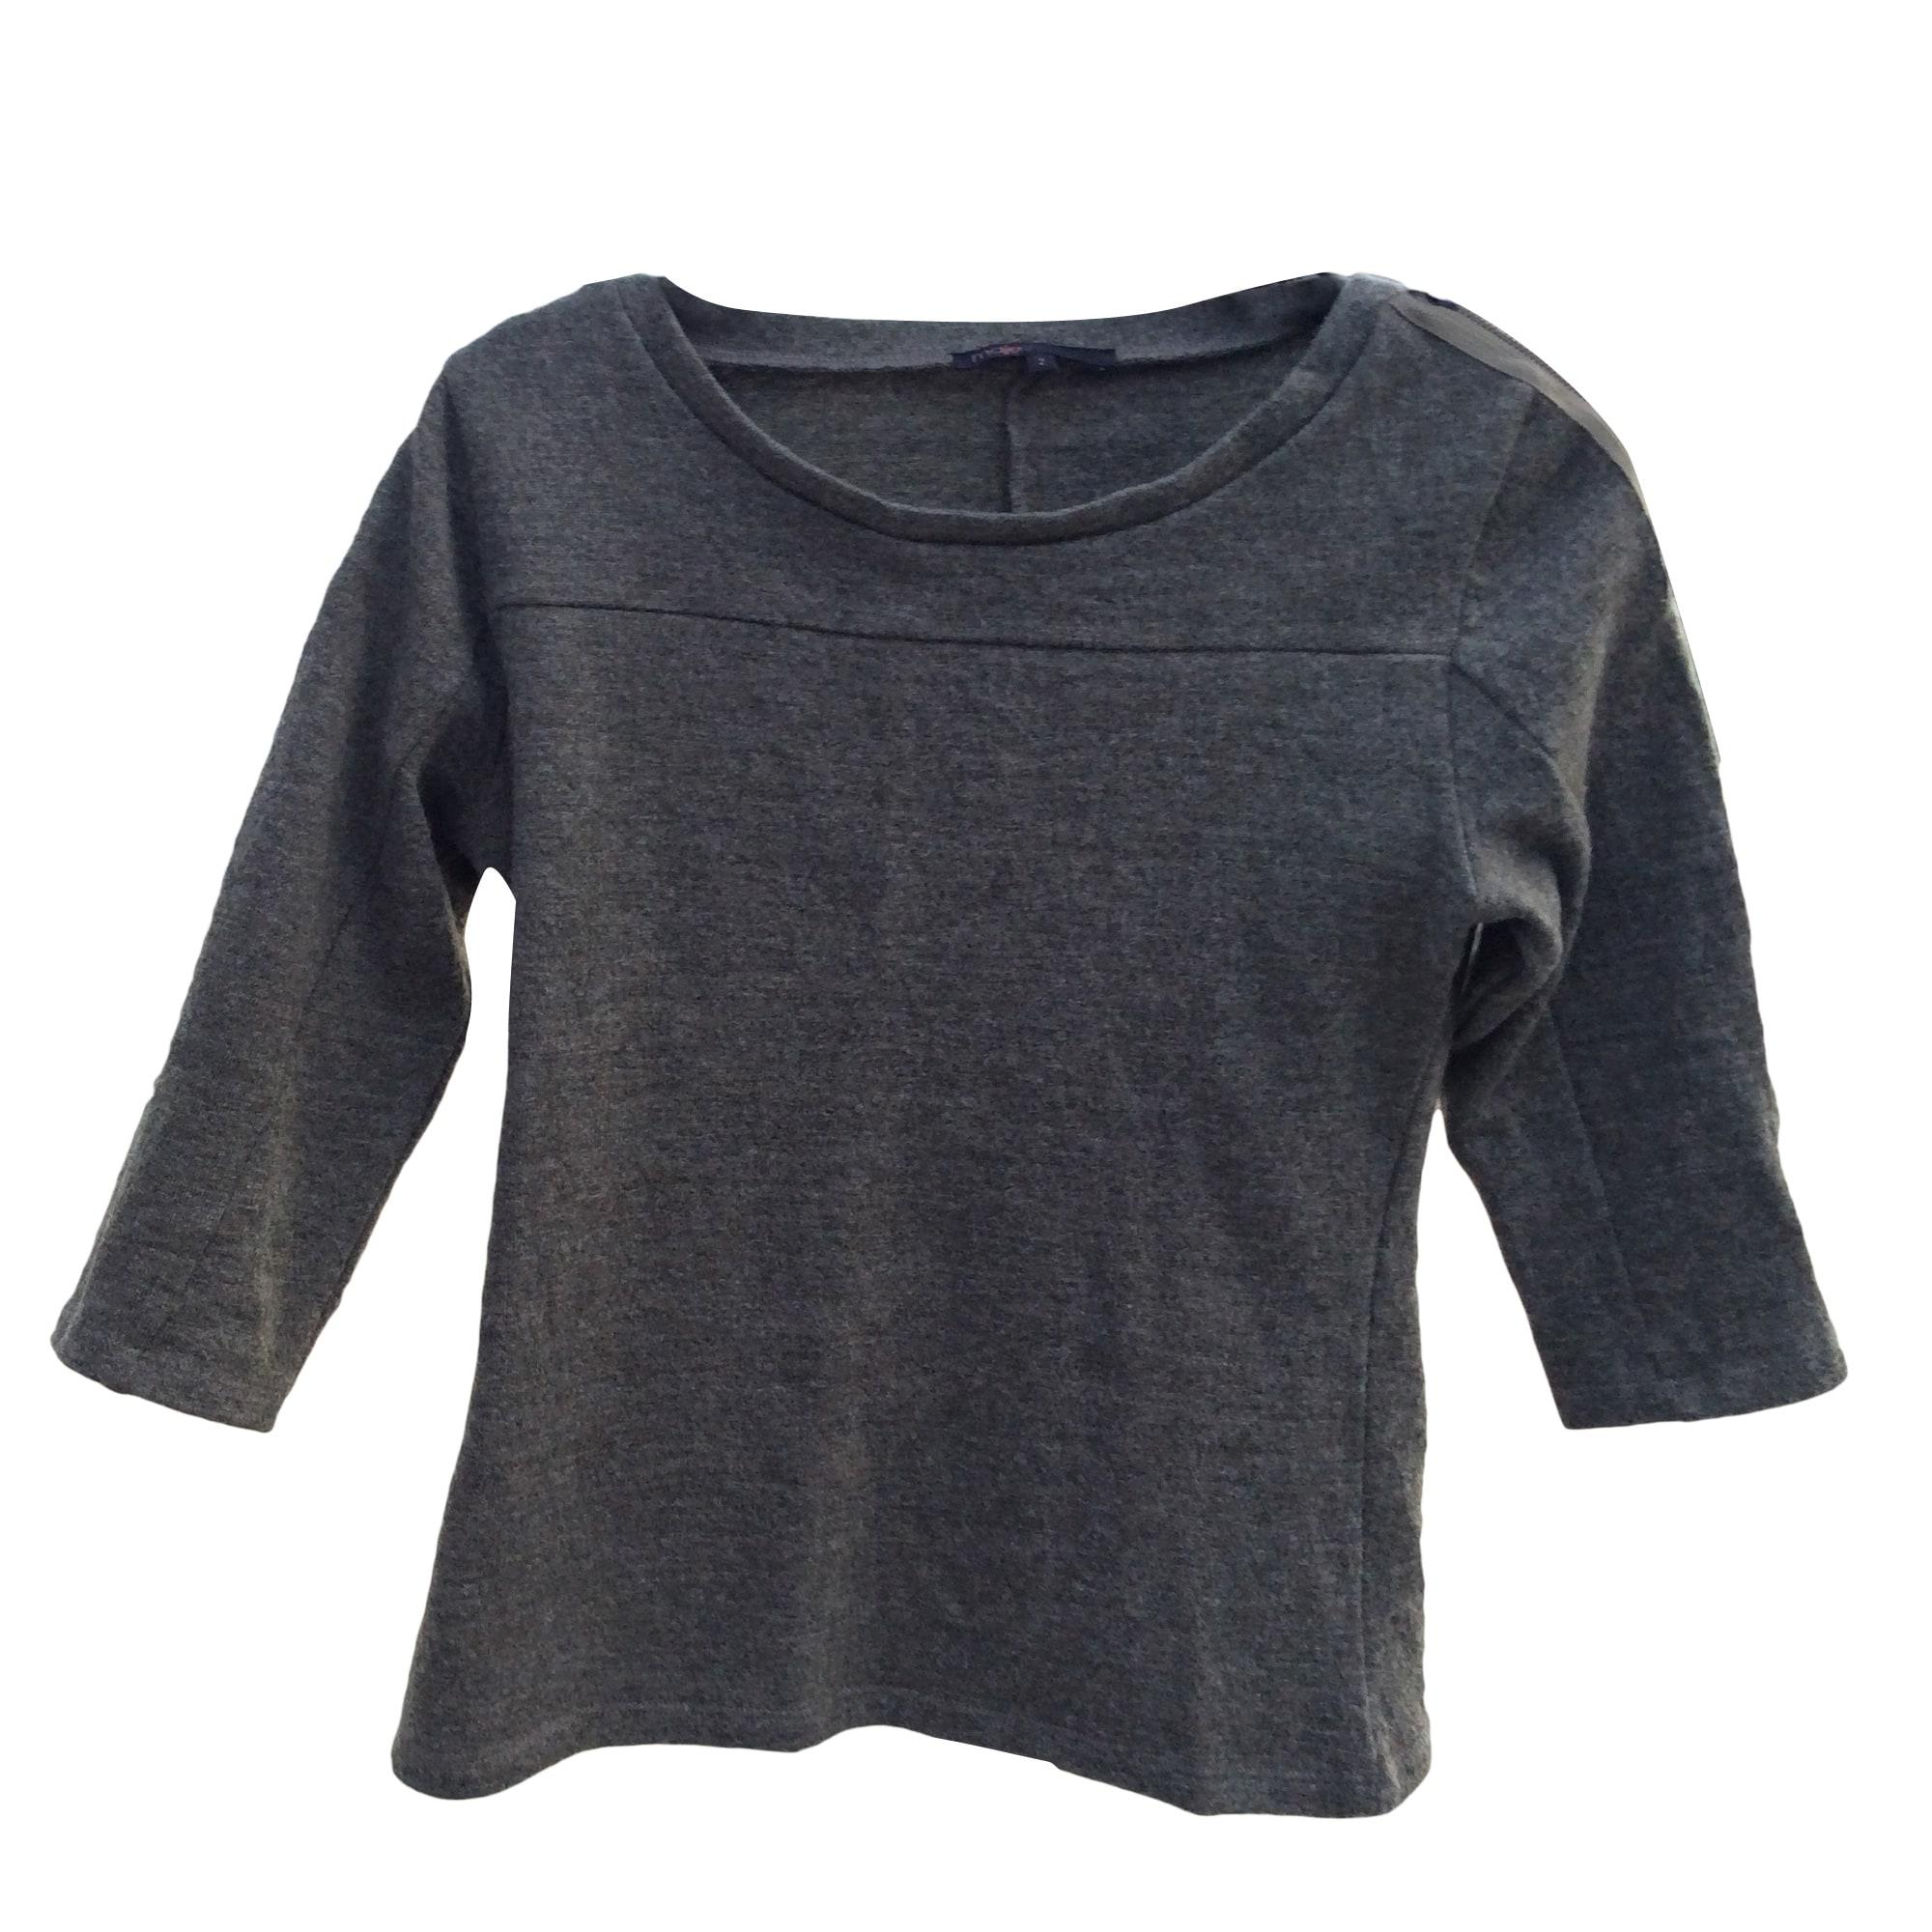 Maje Top, tee-shirt laine 38 (M, T2)